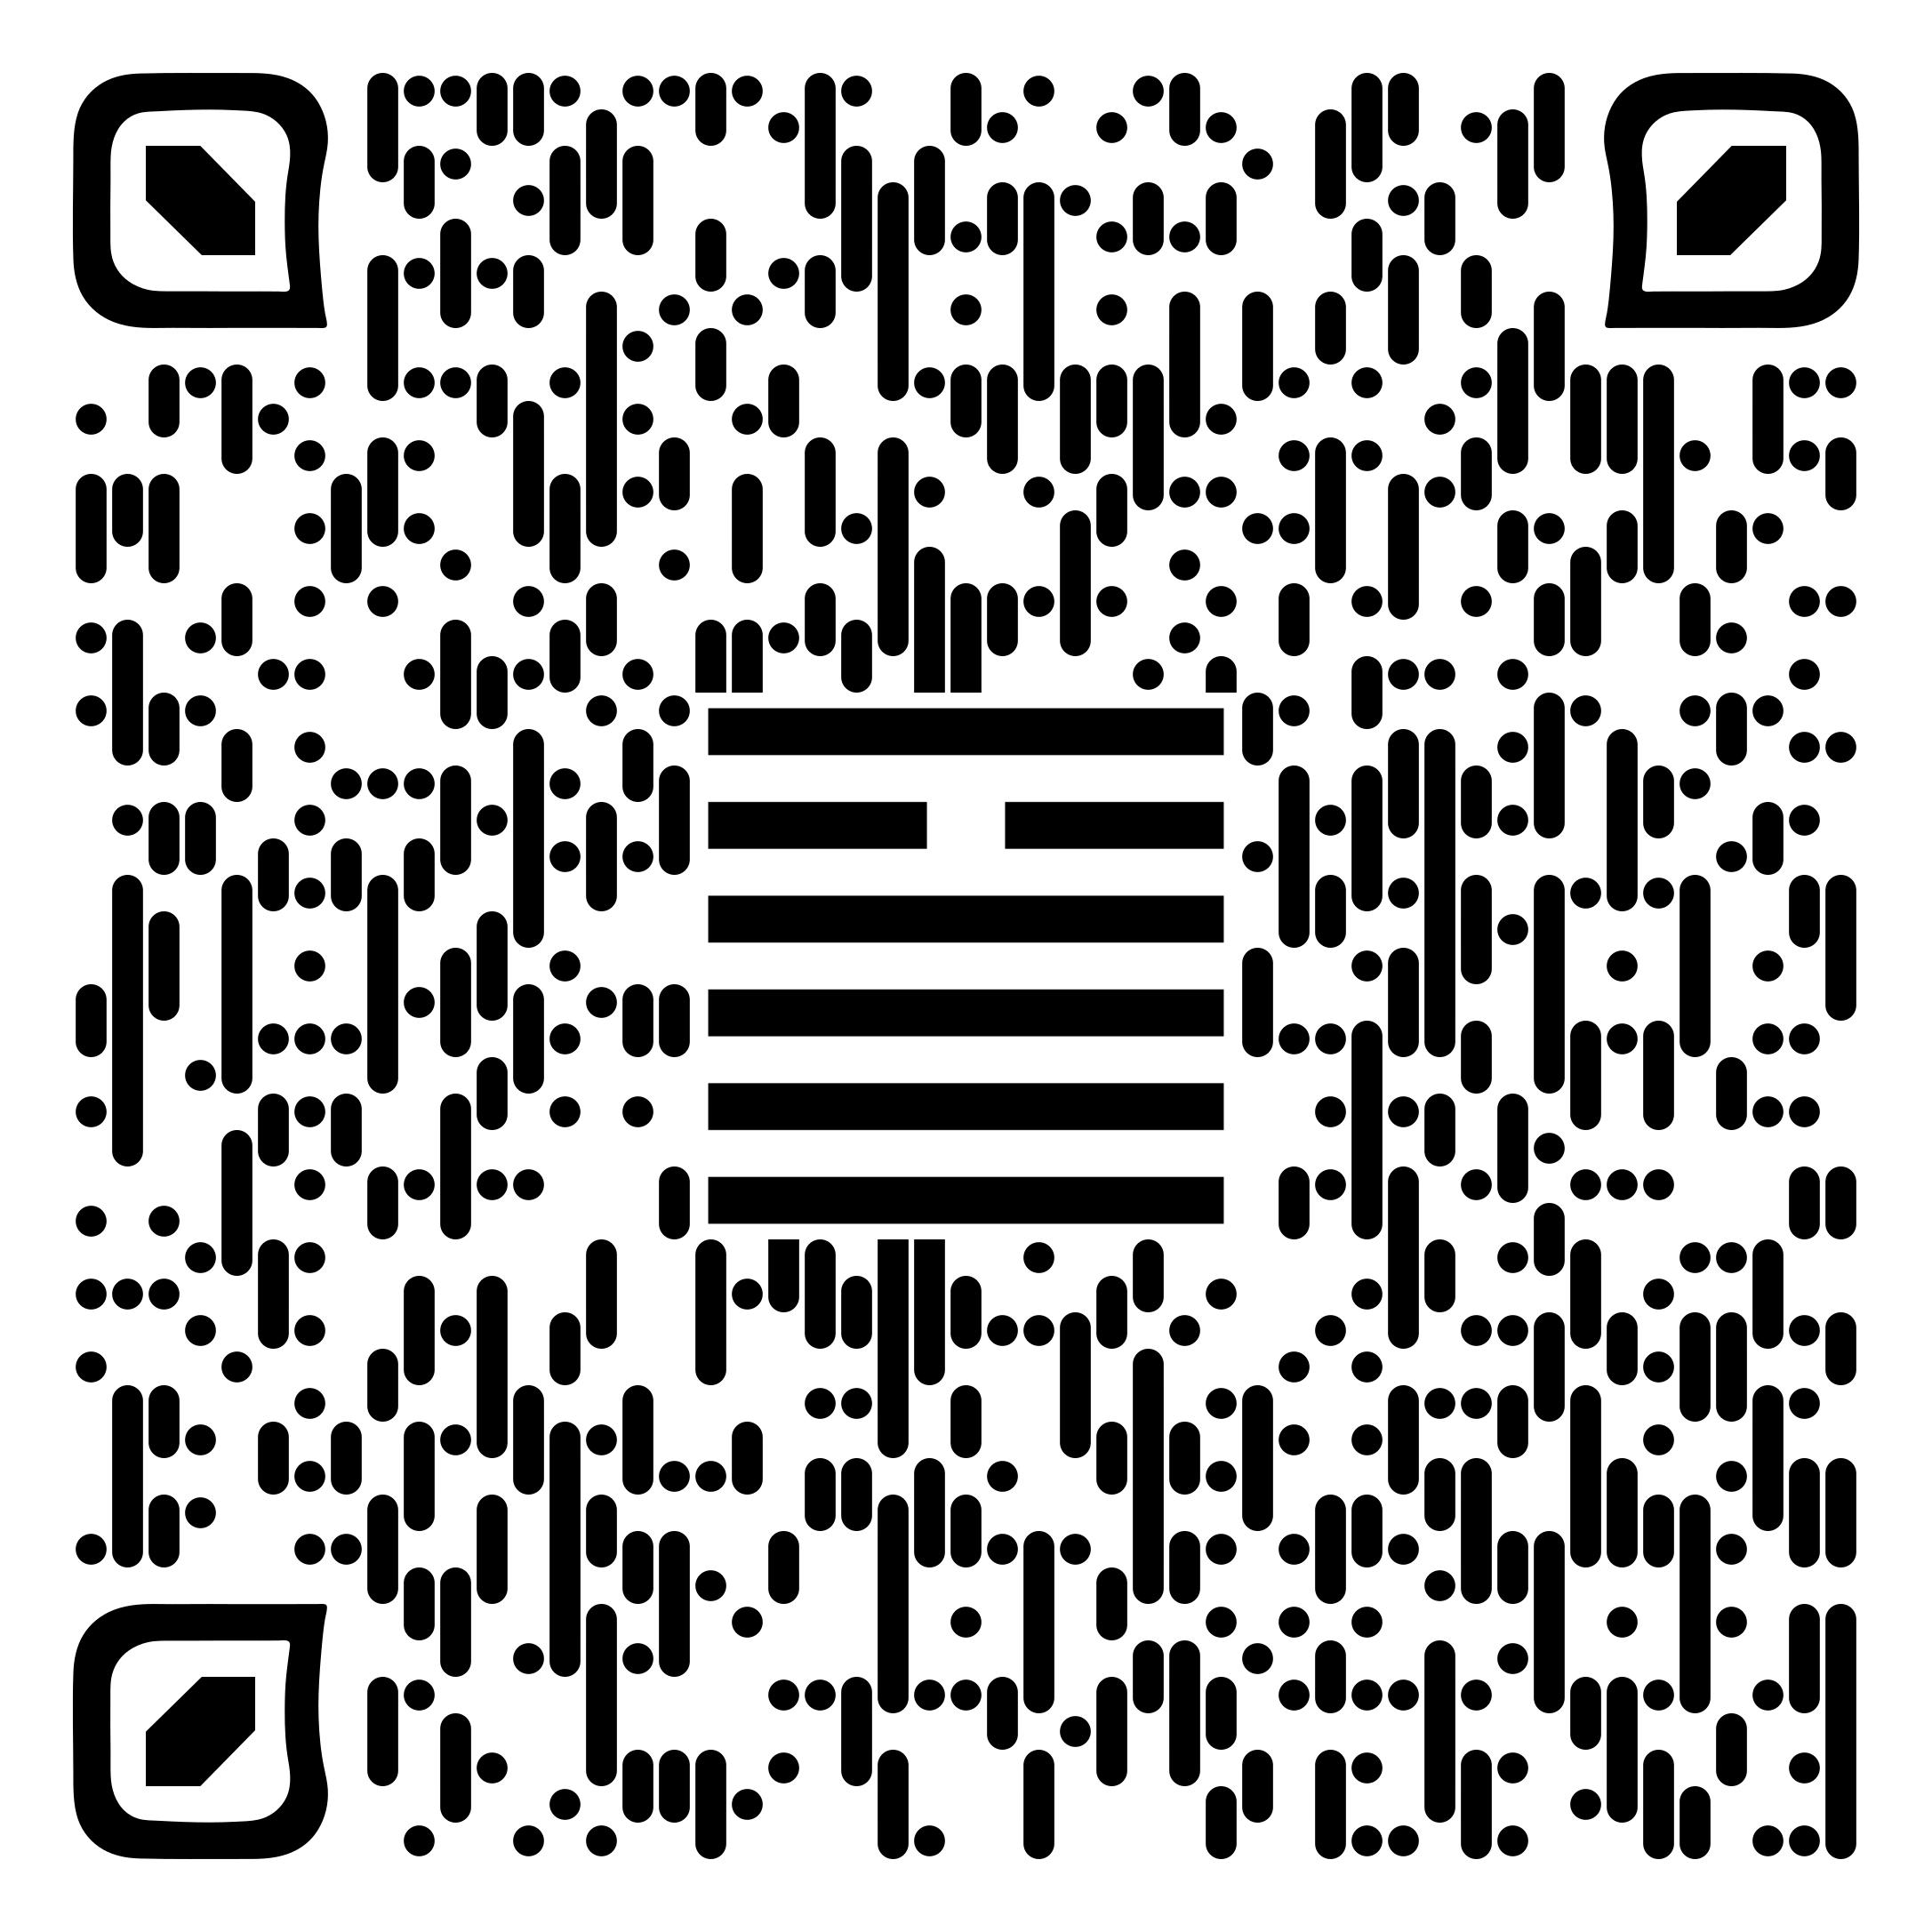 qr-code-14.png